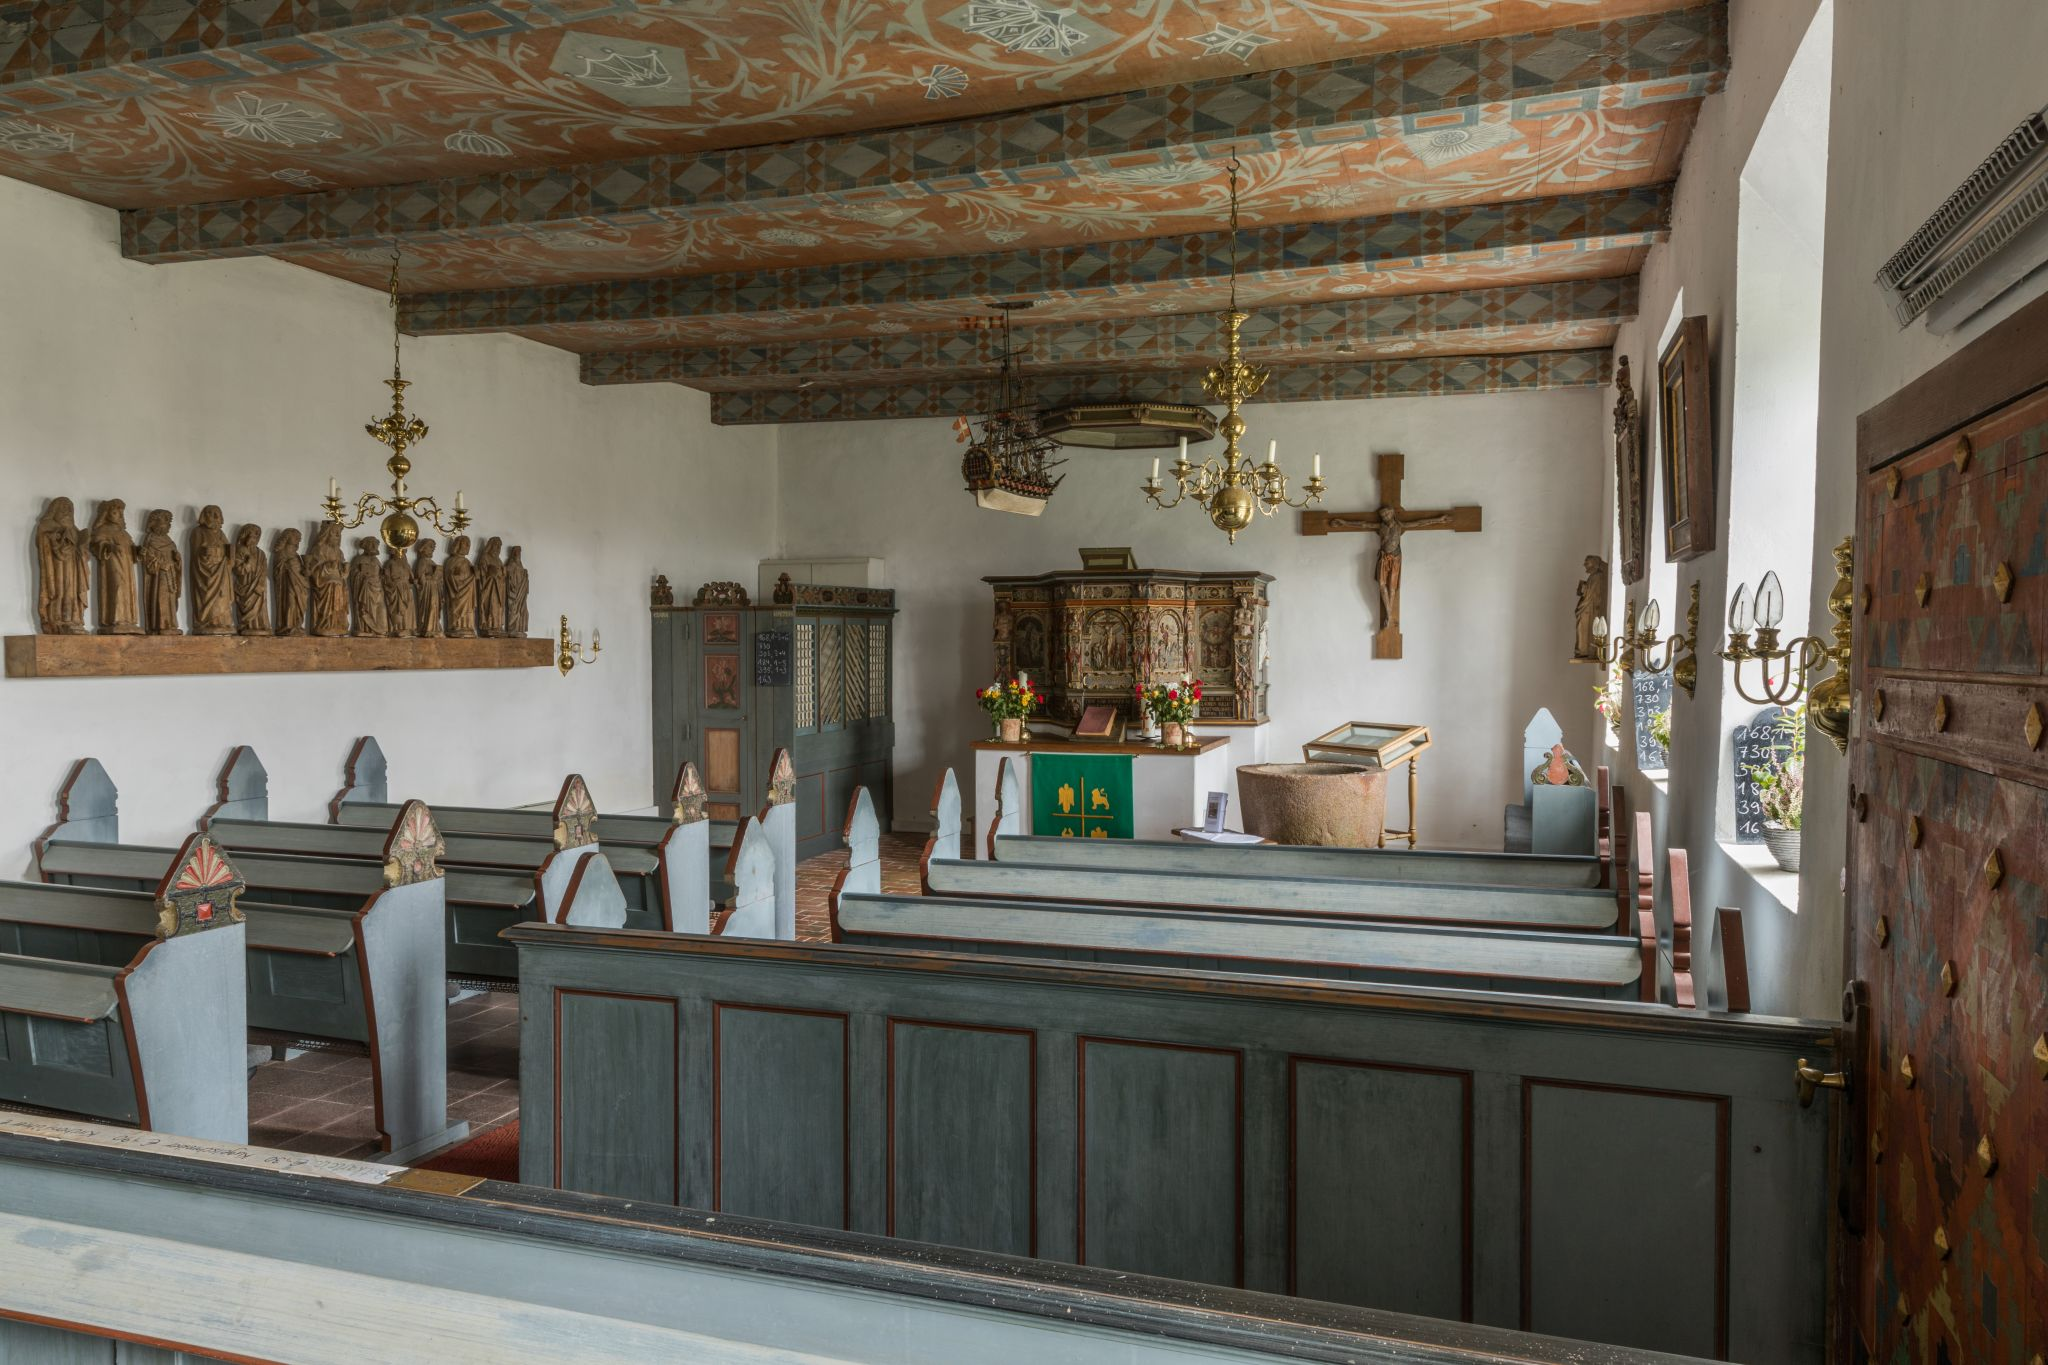 St. Petri church, Hallig Oland, Germany